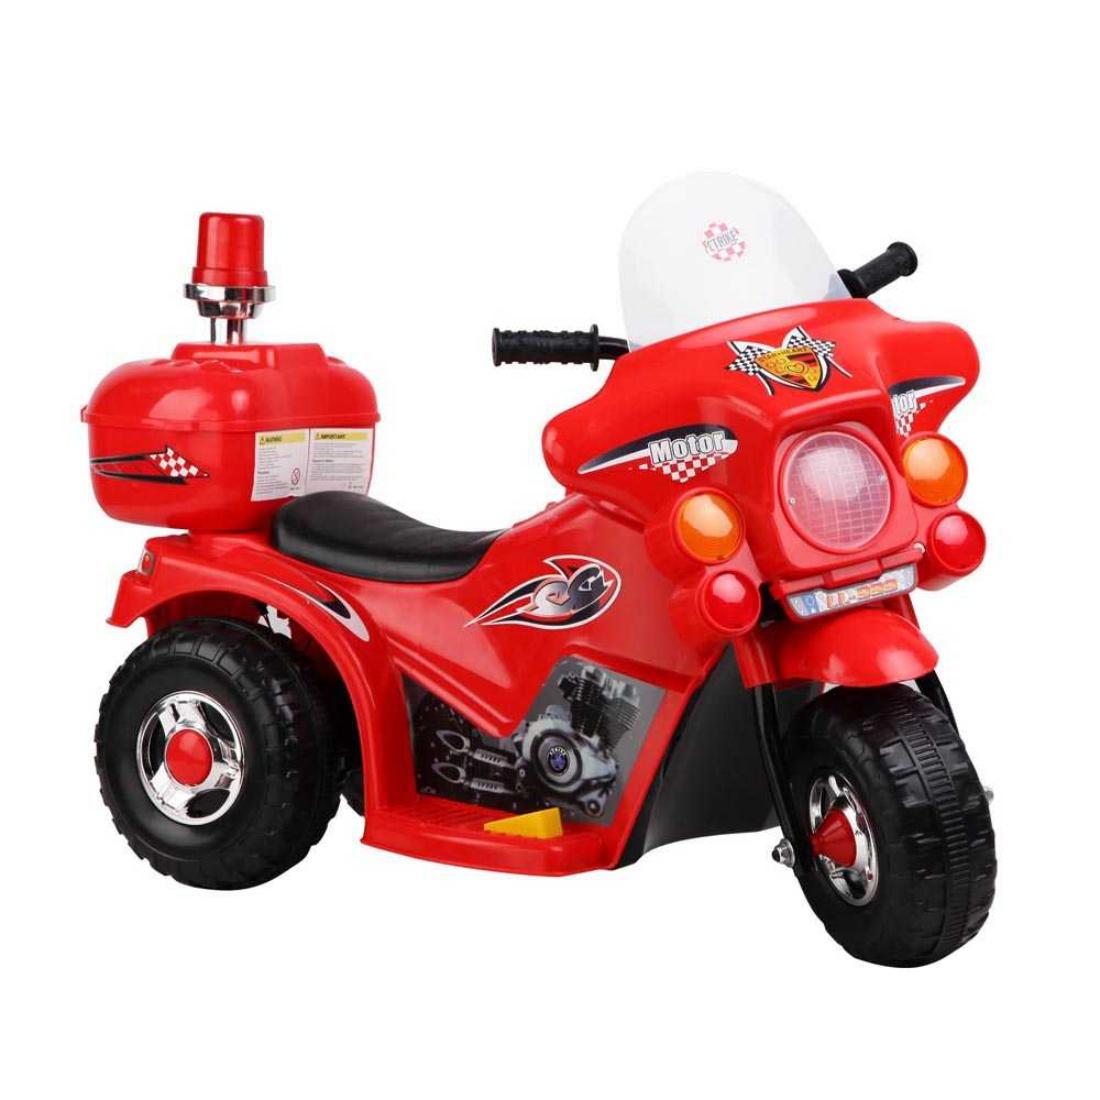 Kids Ride on Motorbike Red Electric Motorcycle